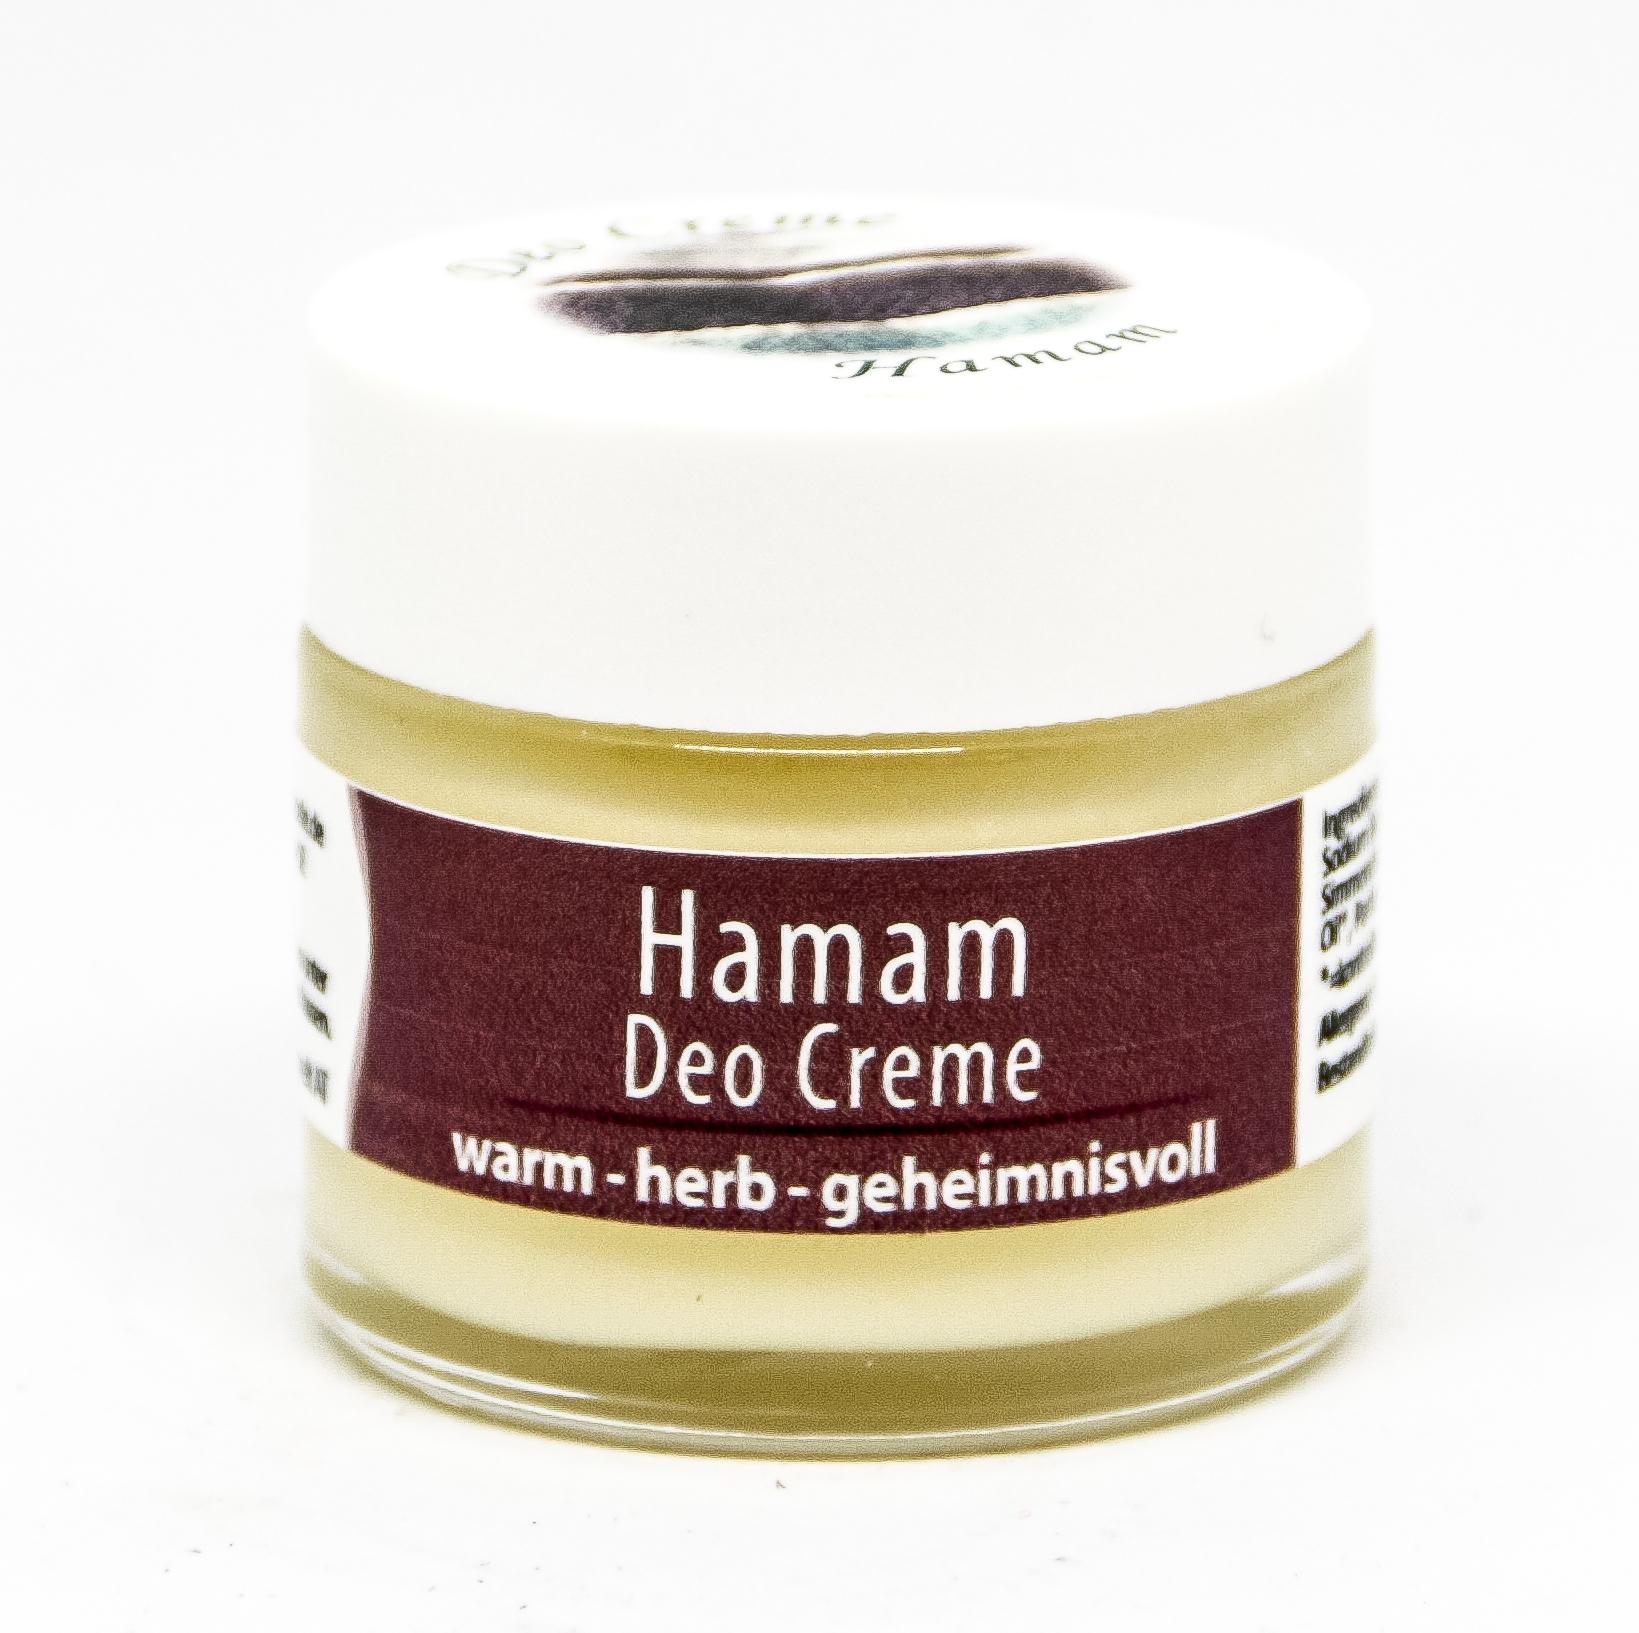 Deo Creme Hamam 30 gr.